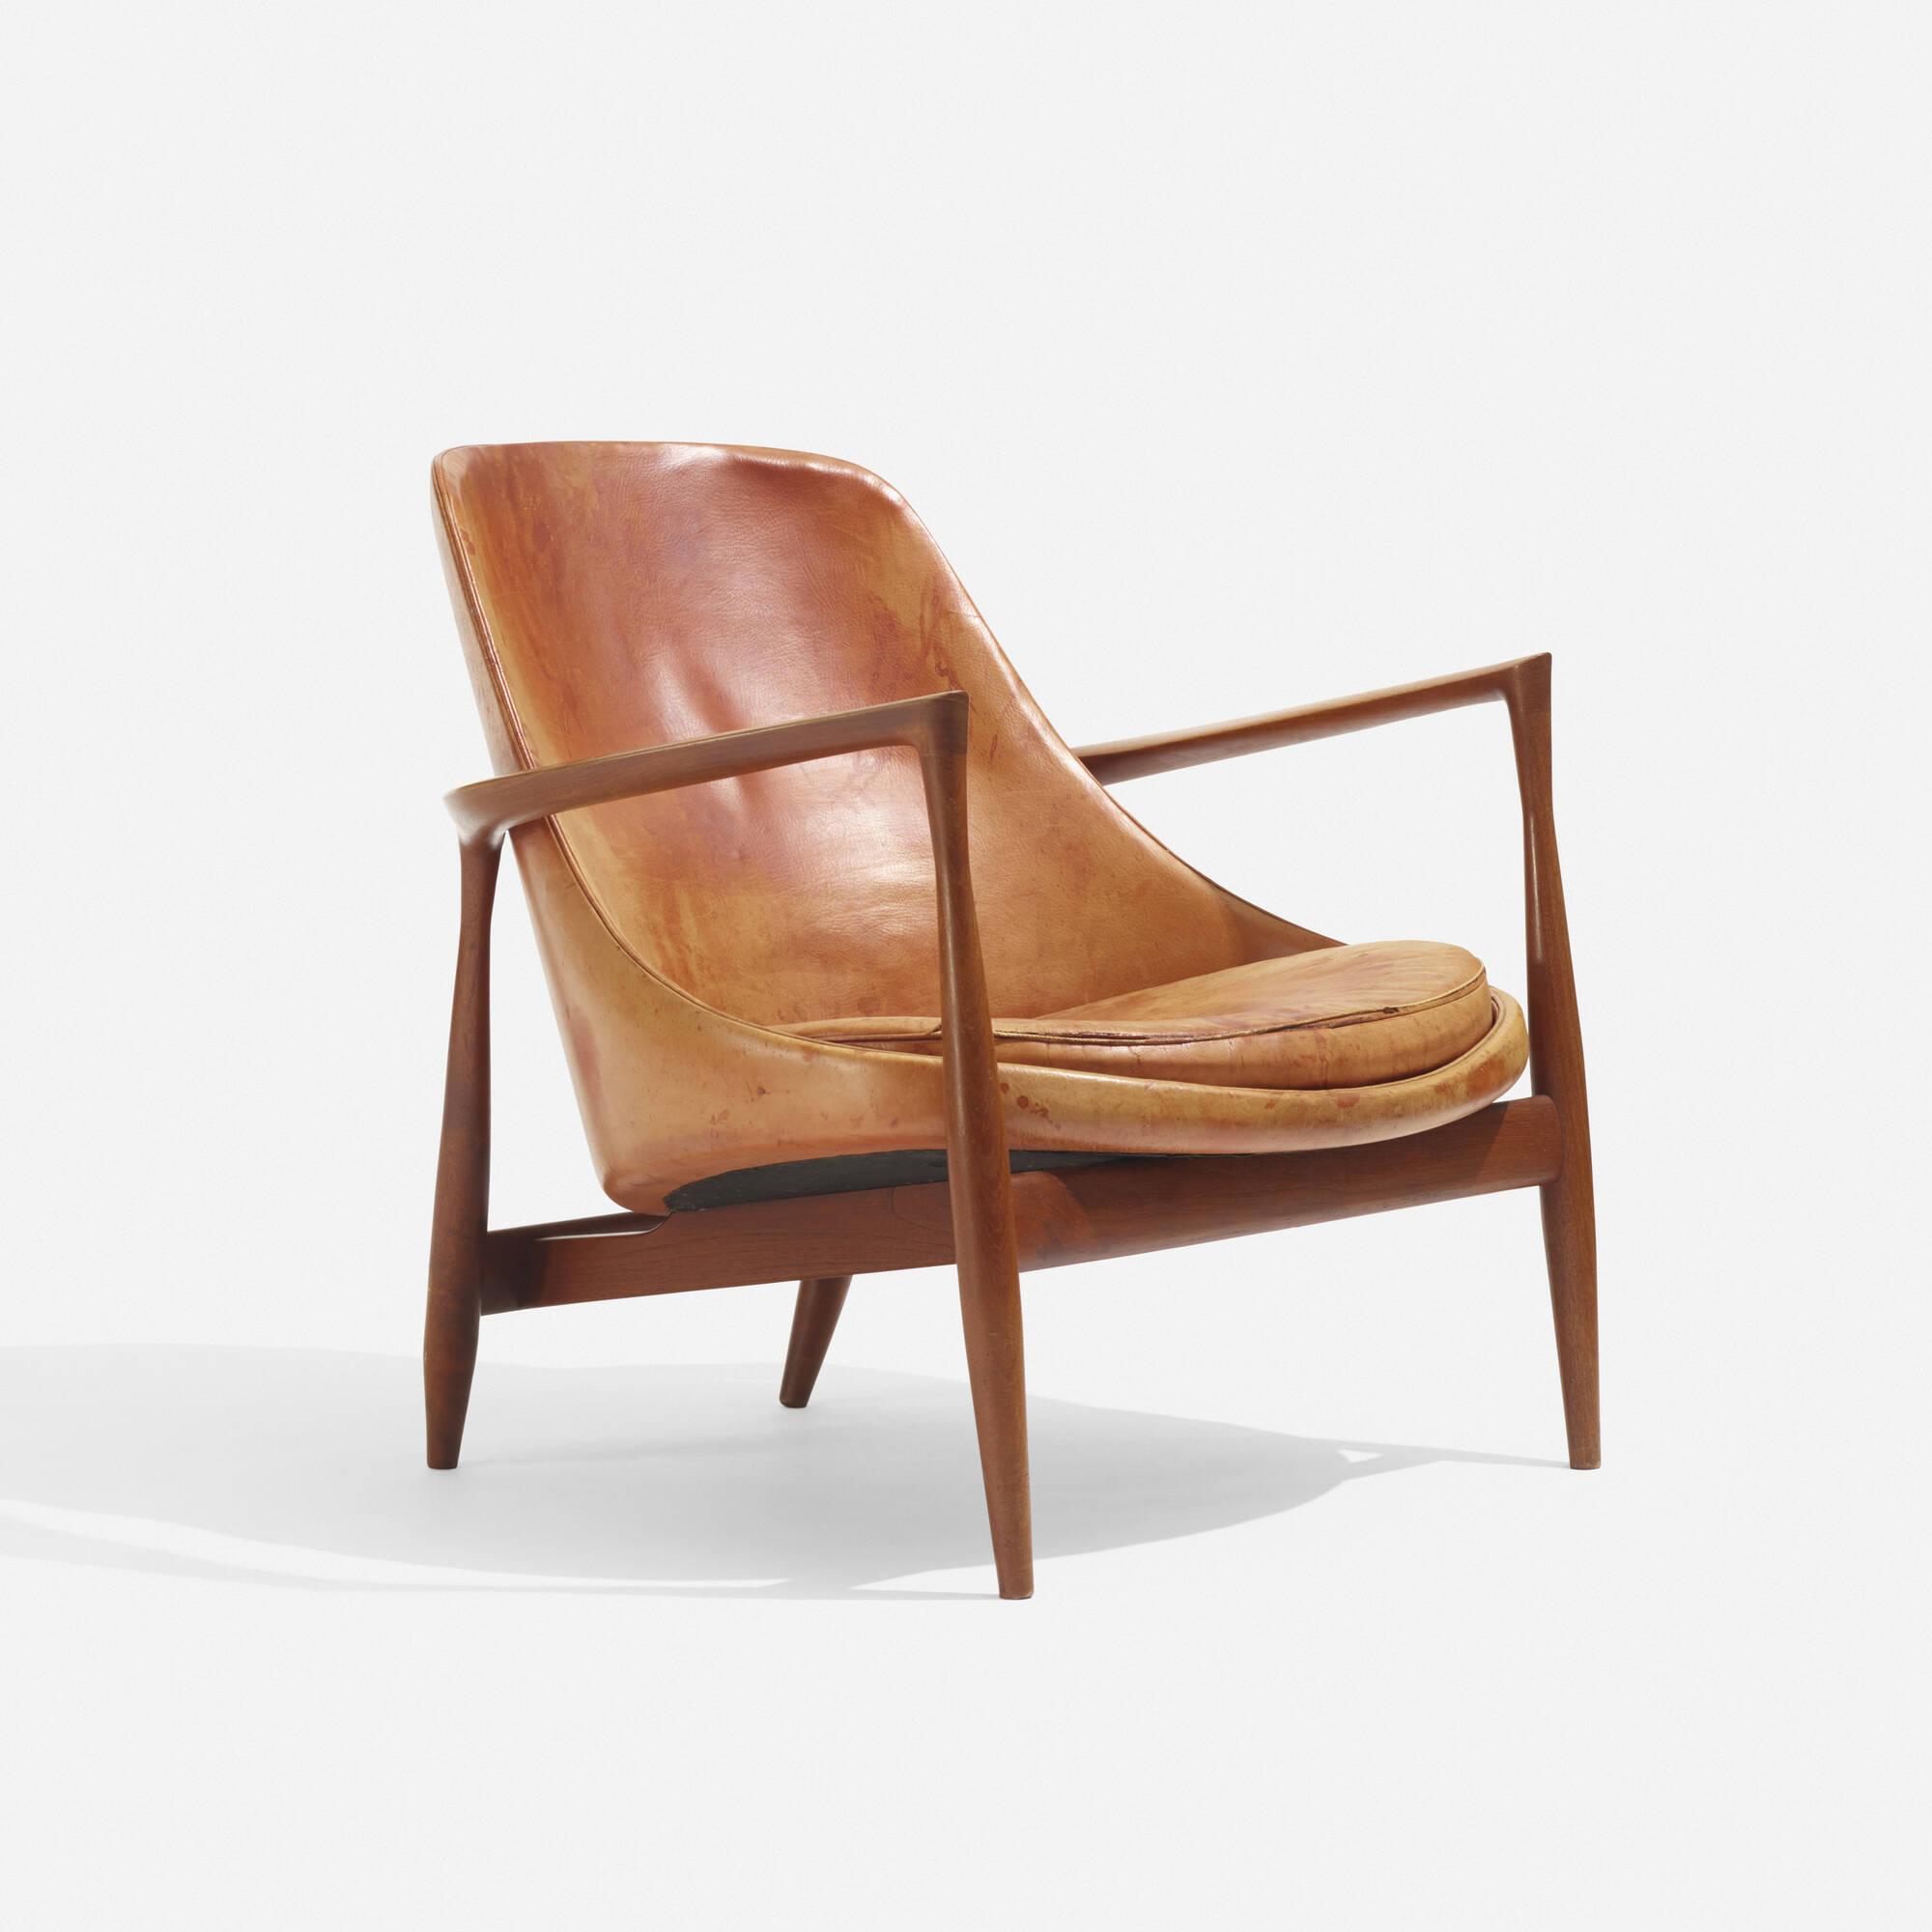 Modern sofa chairs design - 116 Ib Kofod Larsen Elizabeth Chair 1 Of 3